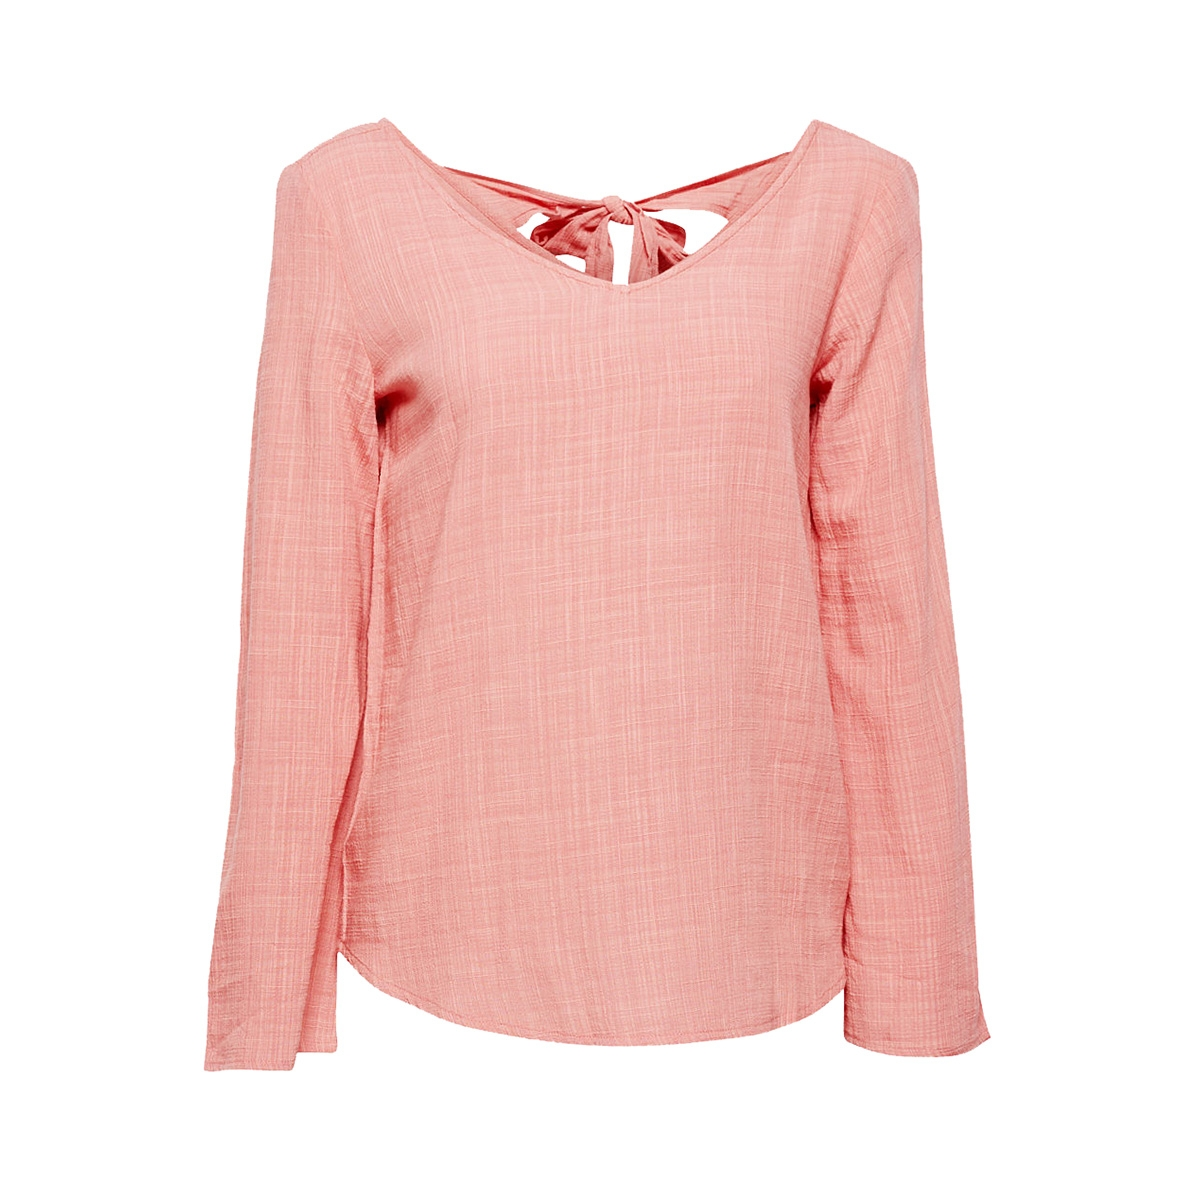 blouse met strik 039cc1f009 edc blouse c665